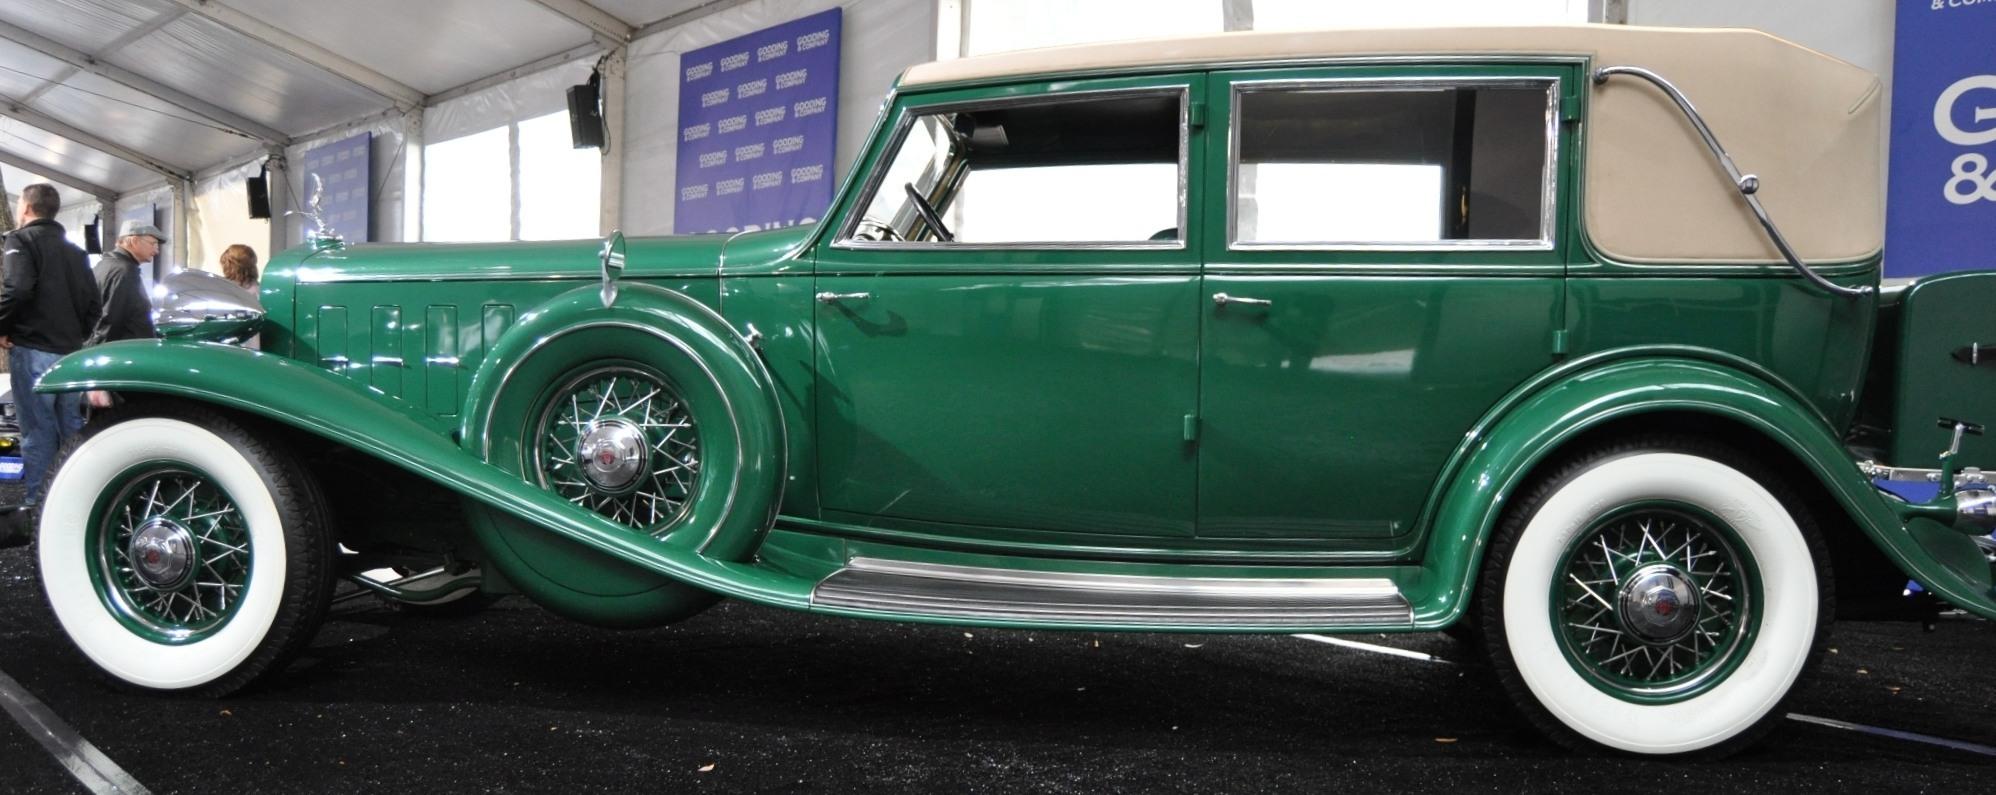 1932 Cadillac V 16 452B Madame X Imperial Sedan Gooding